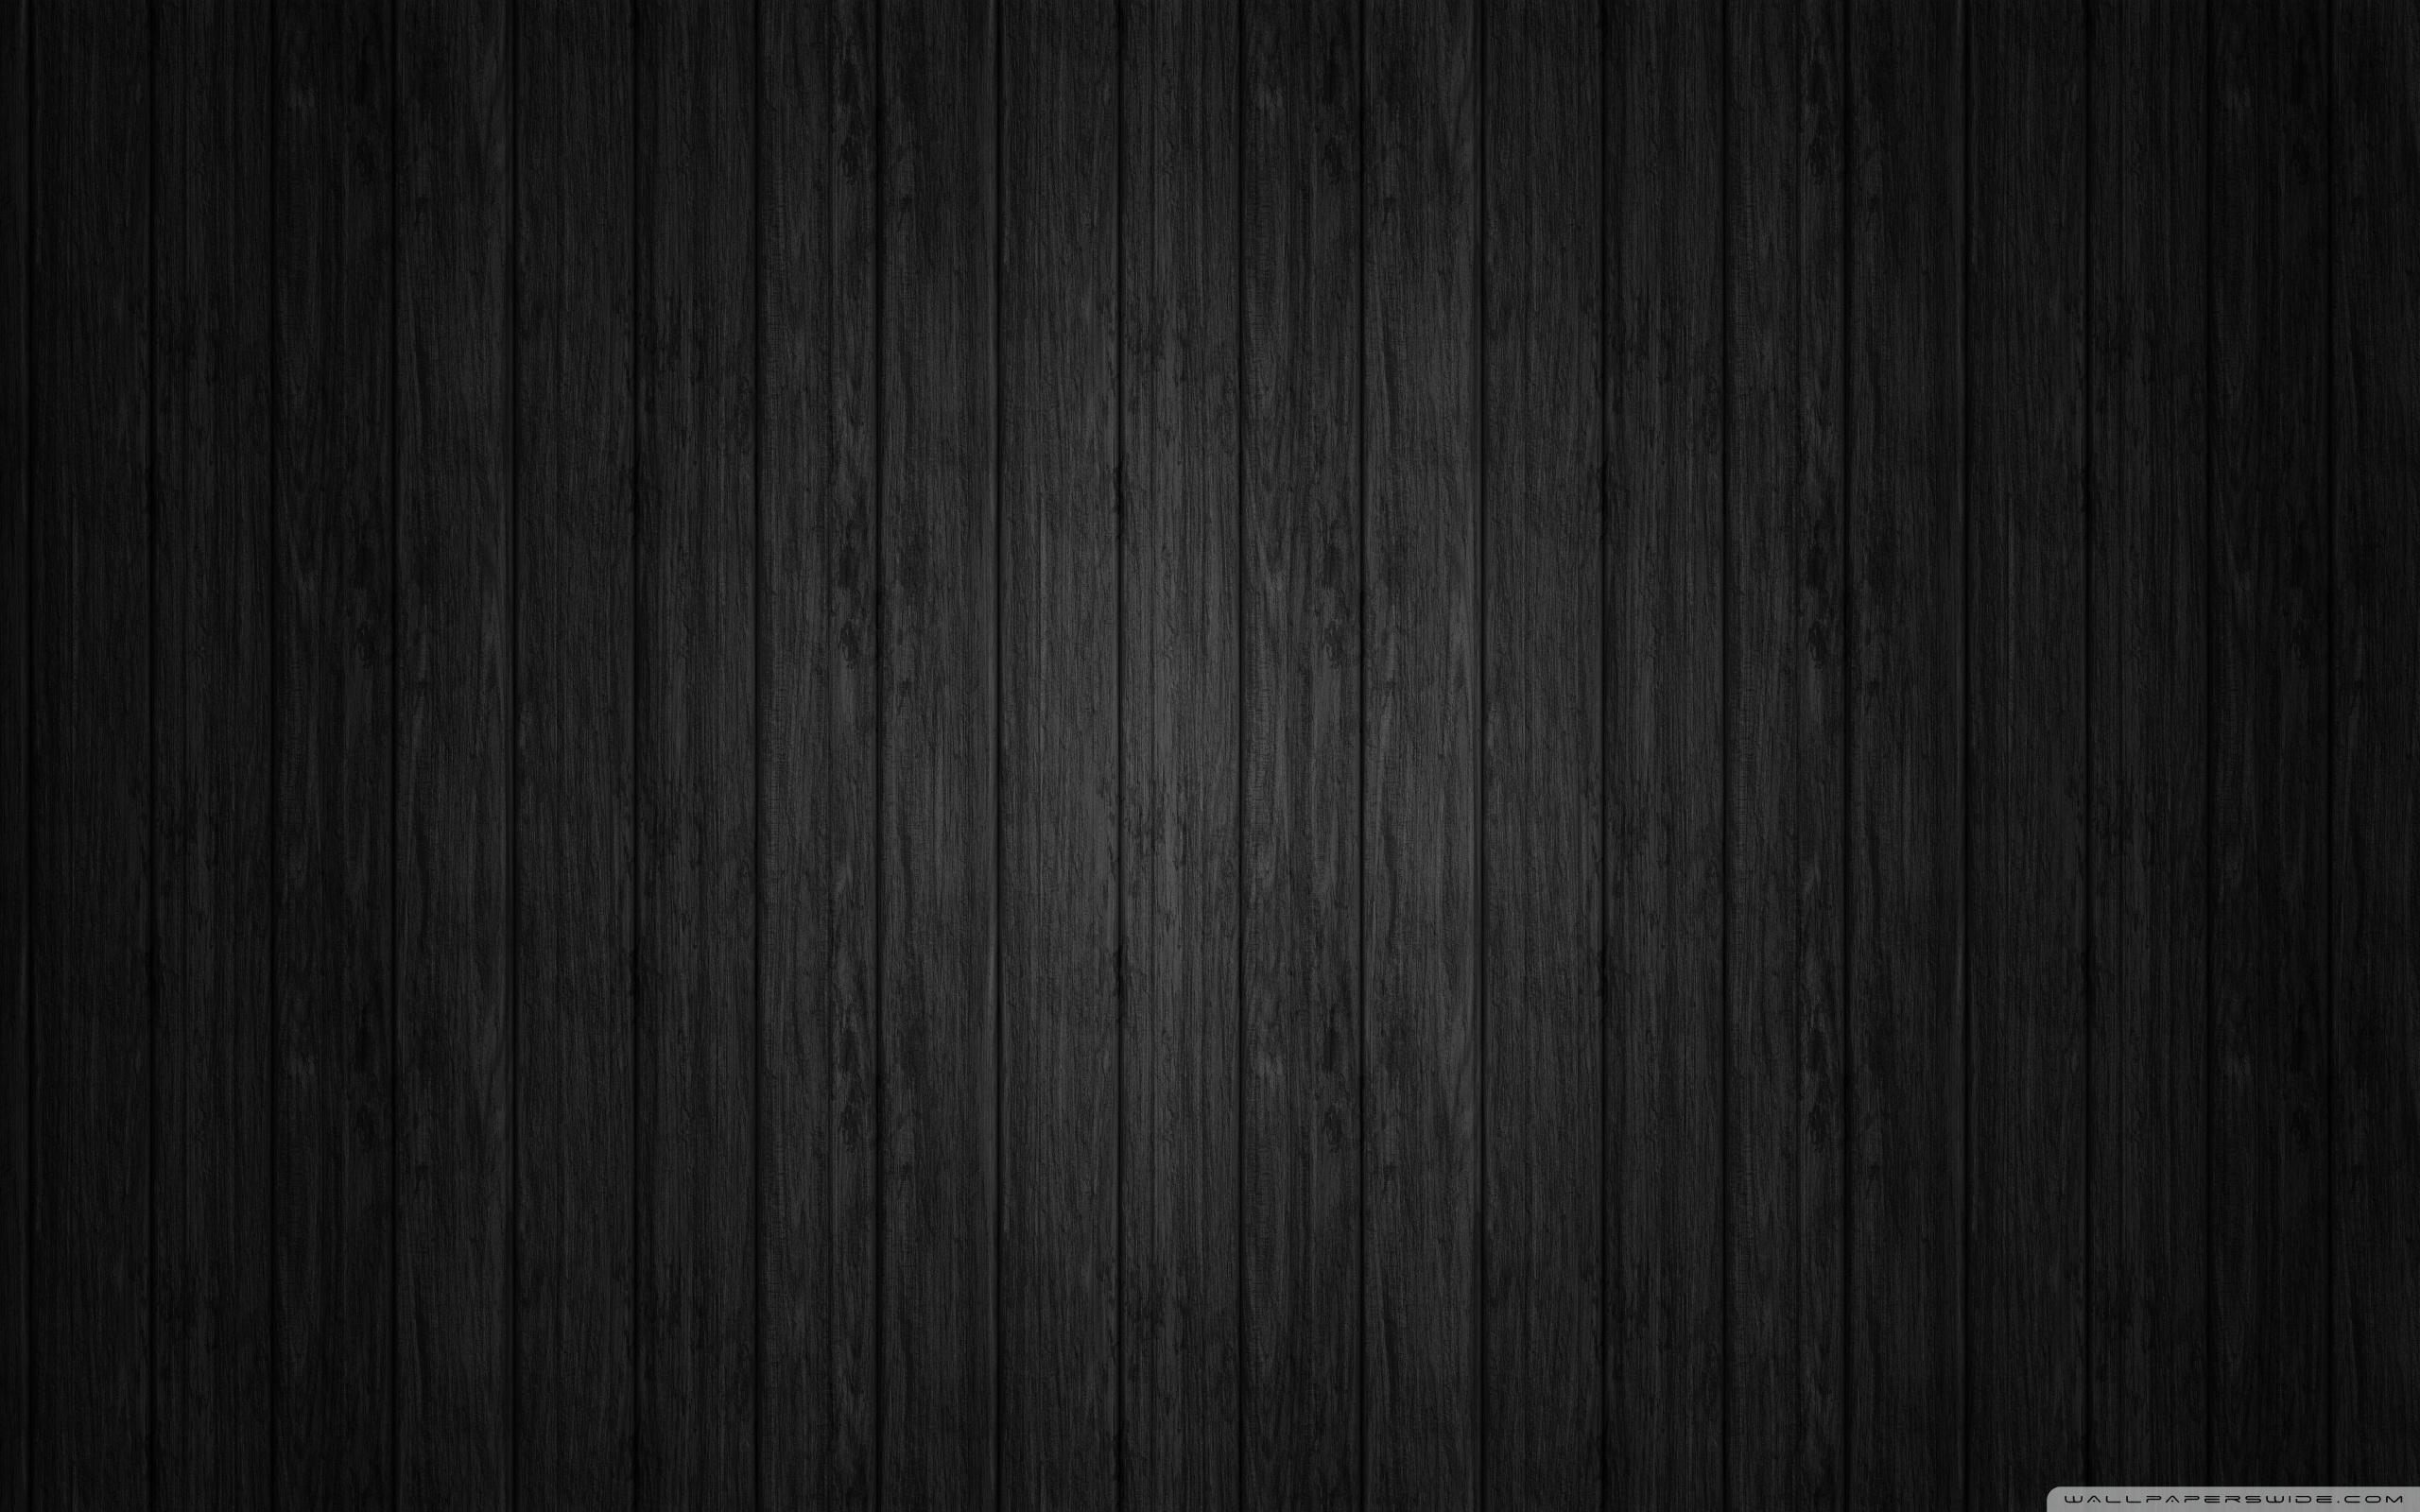 Black Background Images Wallpaper 2560x1600 73807